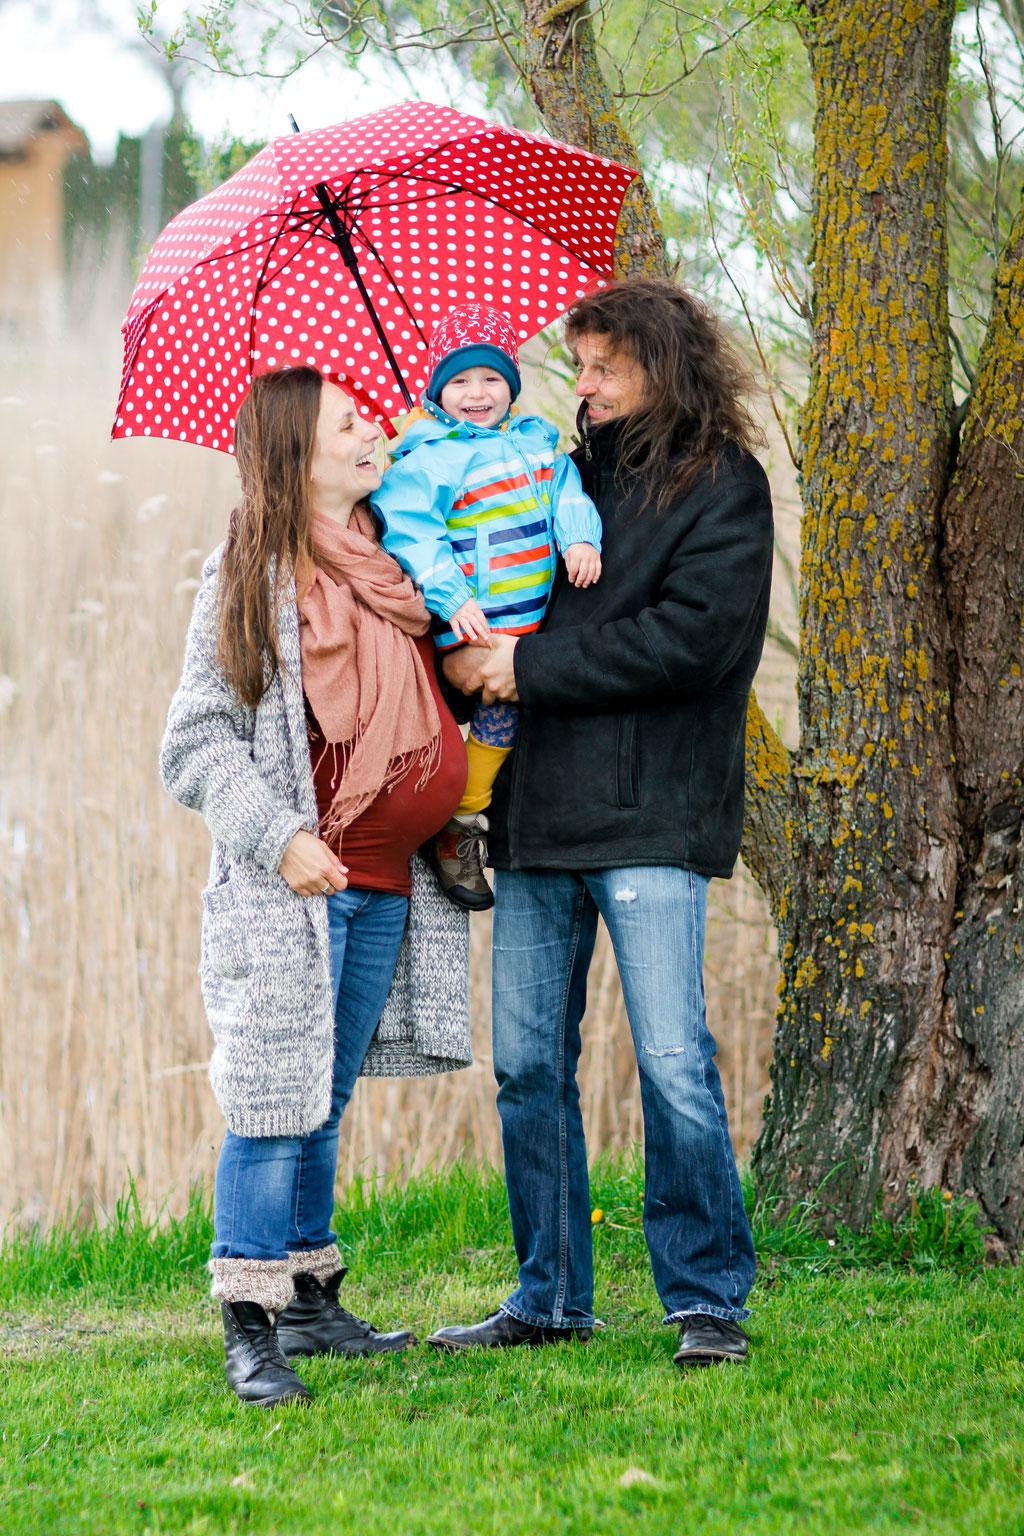 Schwangerschaftsshooting in Neubrandenburg mit Jenny, Christopher & Carl| Familie| Kind| Teich| Schilf| Freude| Regen| Regenschirm| Natur| Lächeln| schwanger| Familie| Greifswald| Hendrikje Richert Fotografie